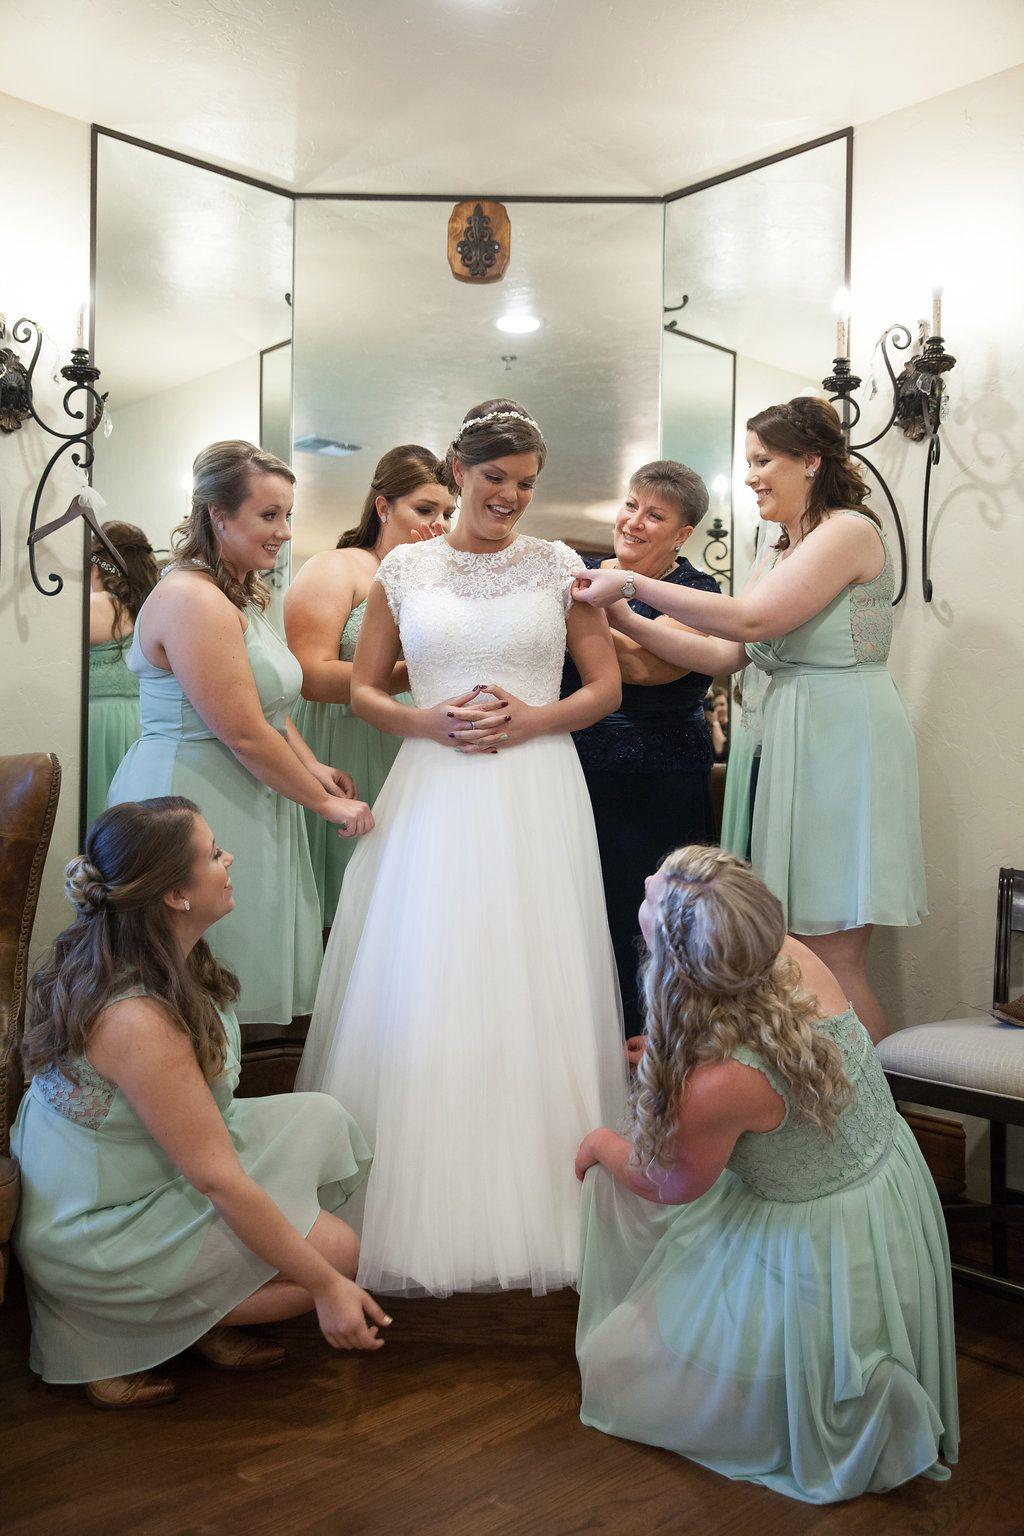 Wedding dresses tulsa  bridesmaids helping the bride with her dress  bridesmaid photo